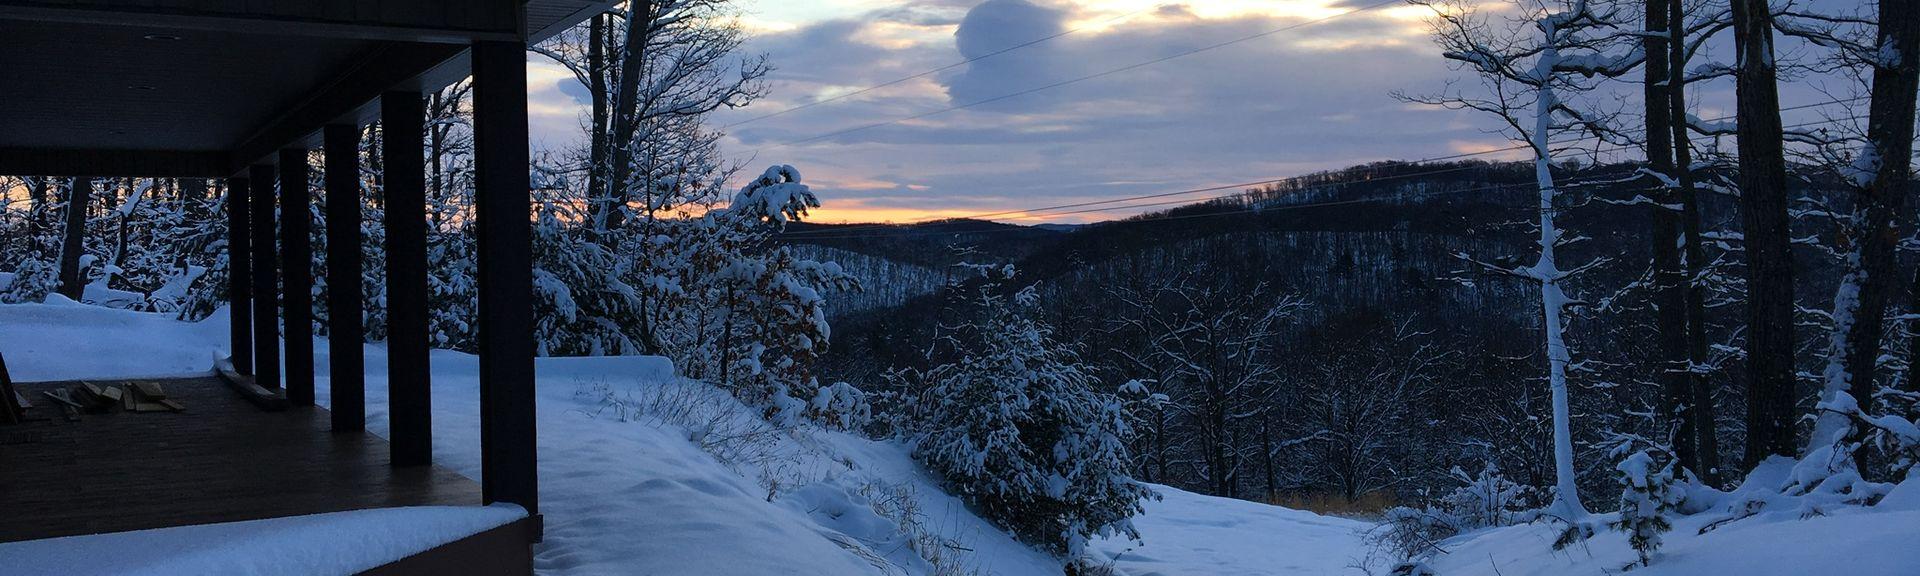 Mount Union, Pennsylvania, United States of America